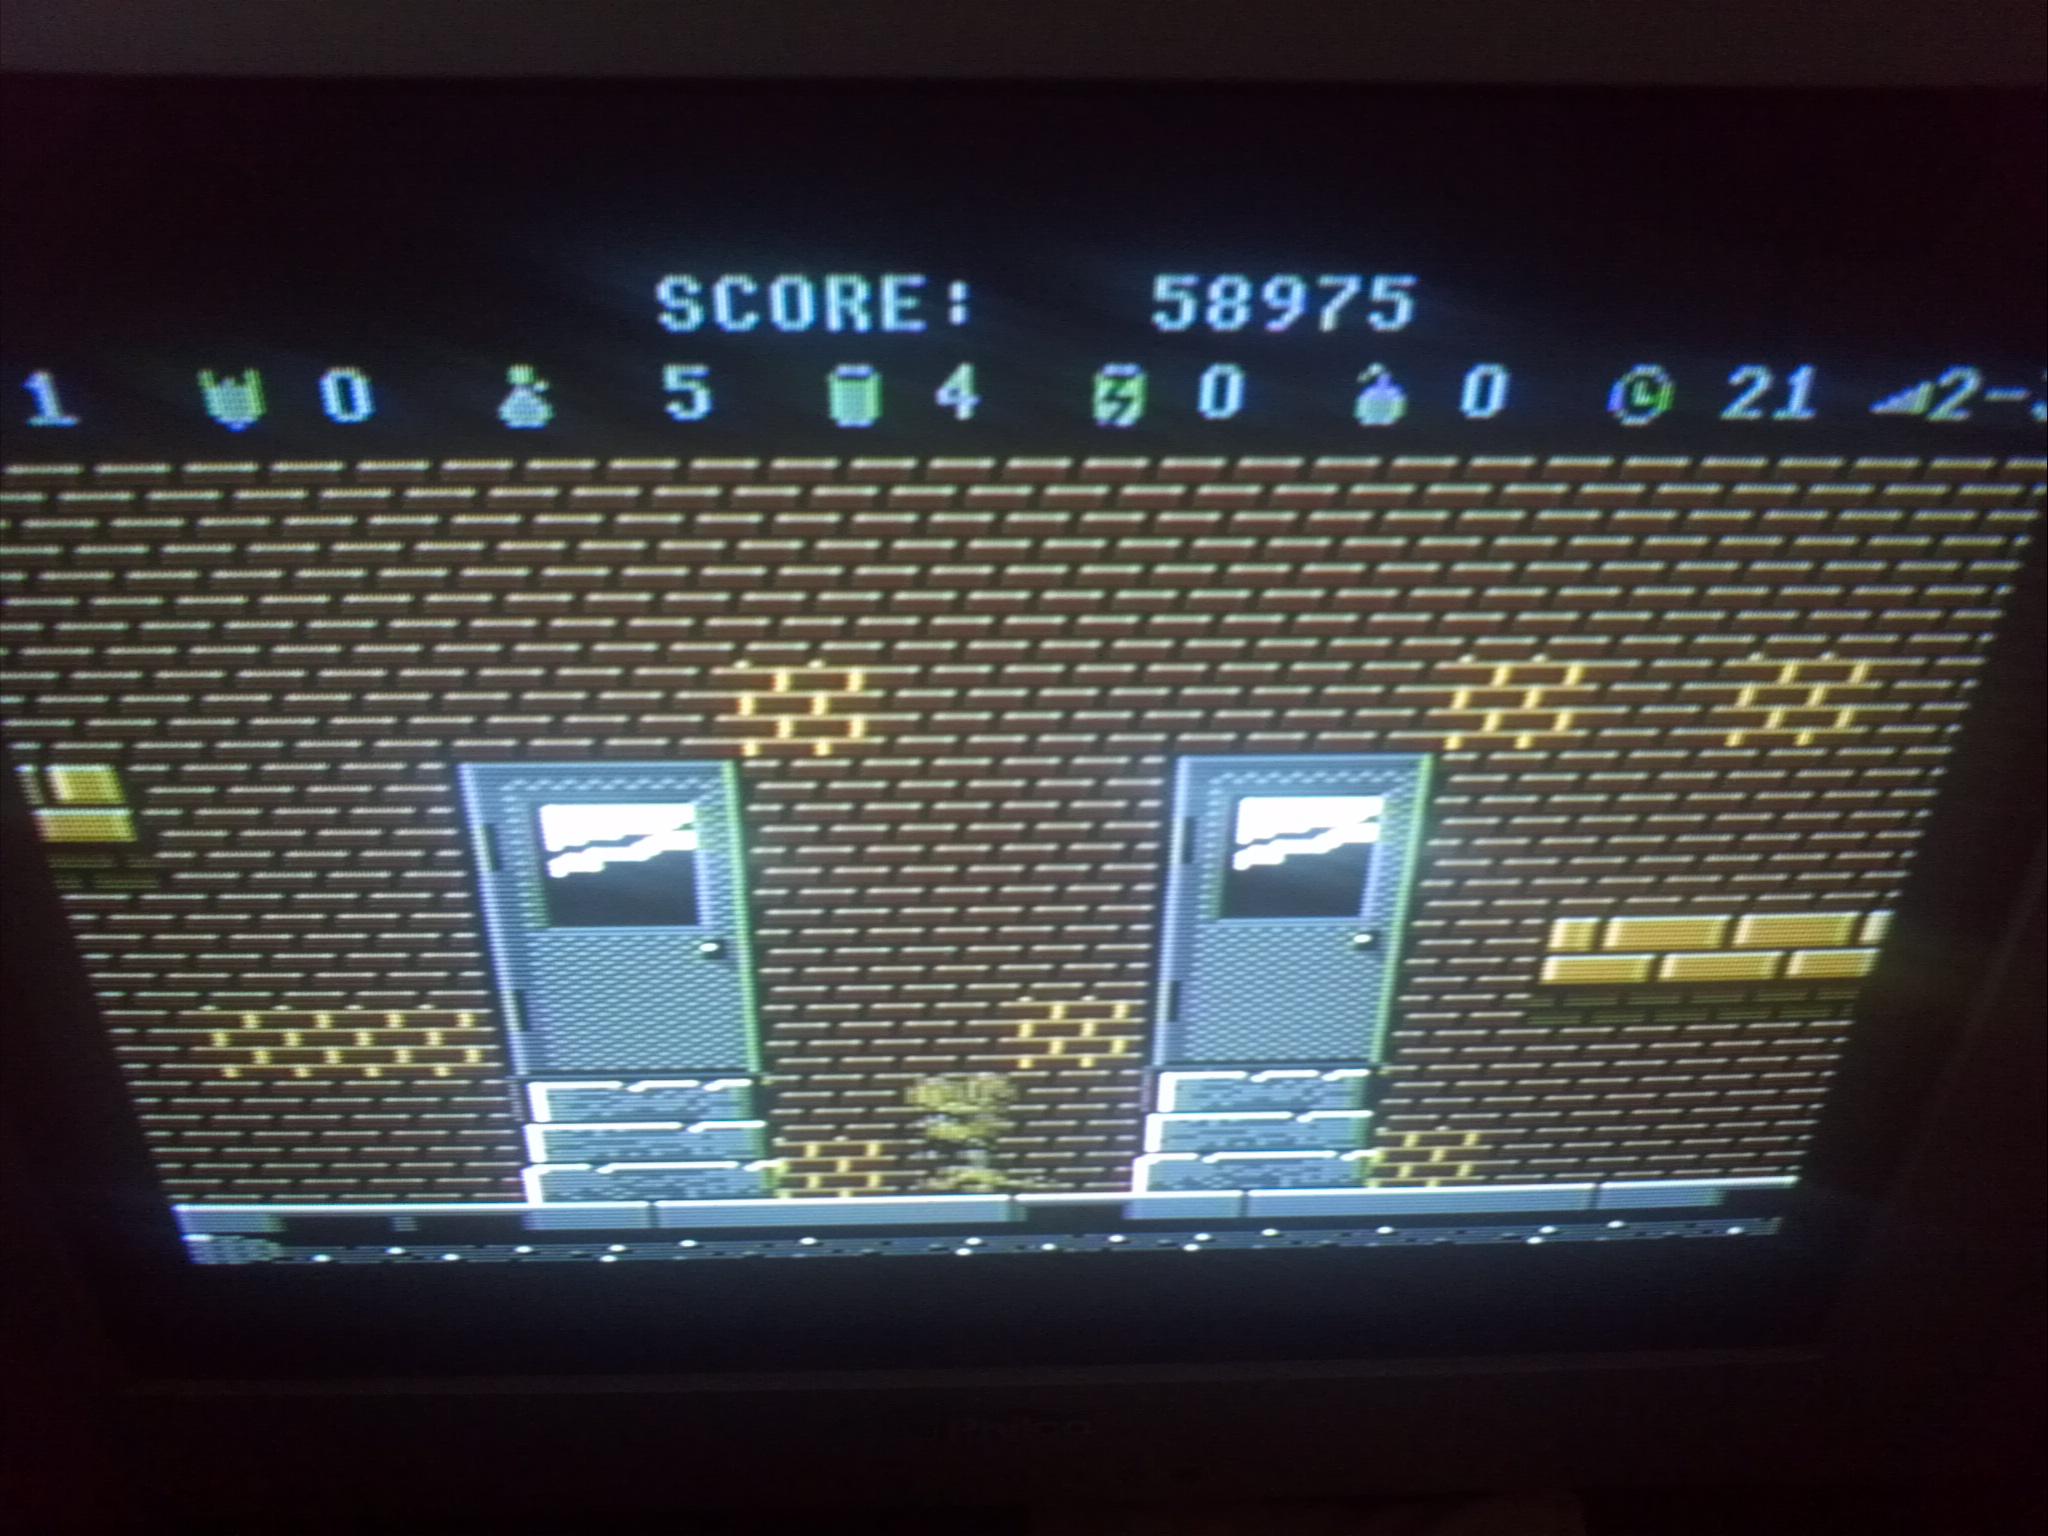 Liduario: Scrapyard Dog (Atari 7800) 58,975 points on 2014-11-30 12:02:26